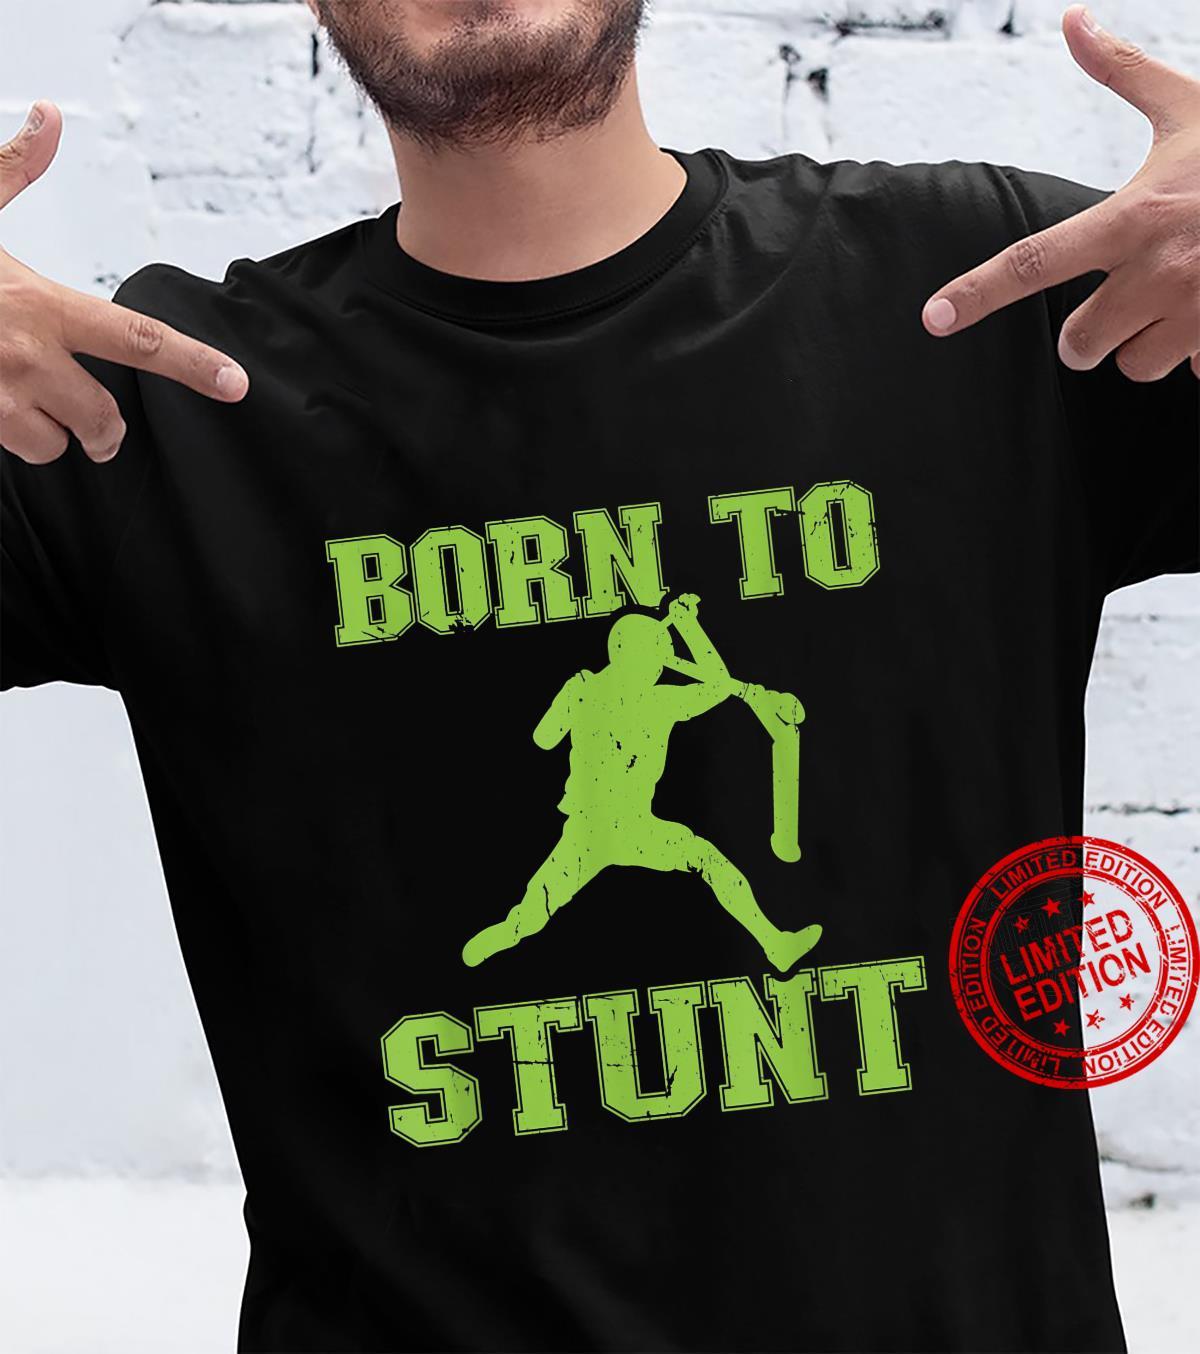 Stunt Scooter Rider Shirt